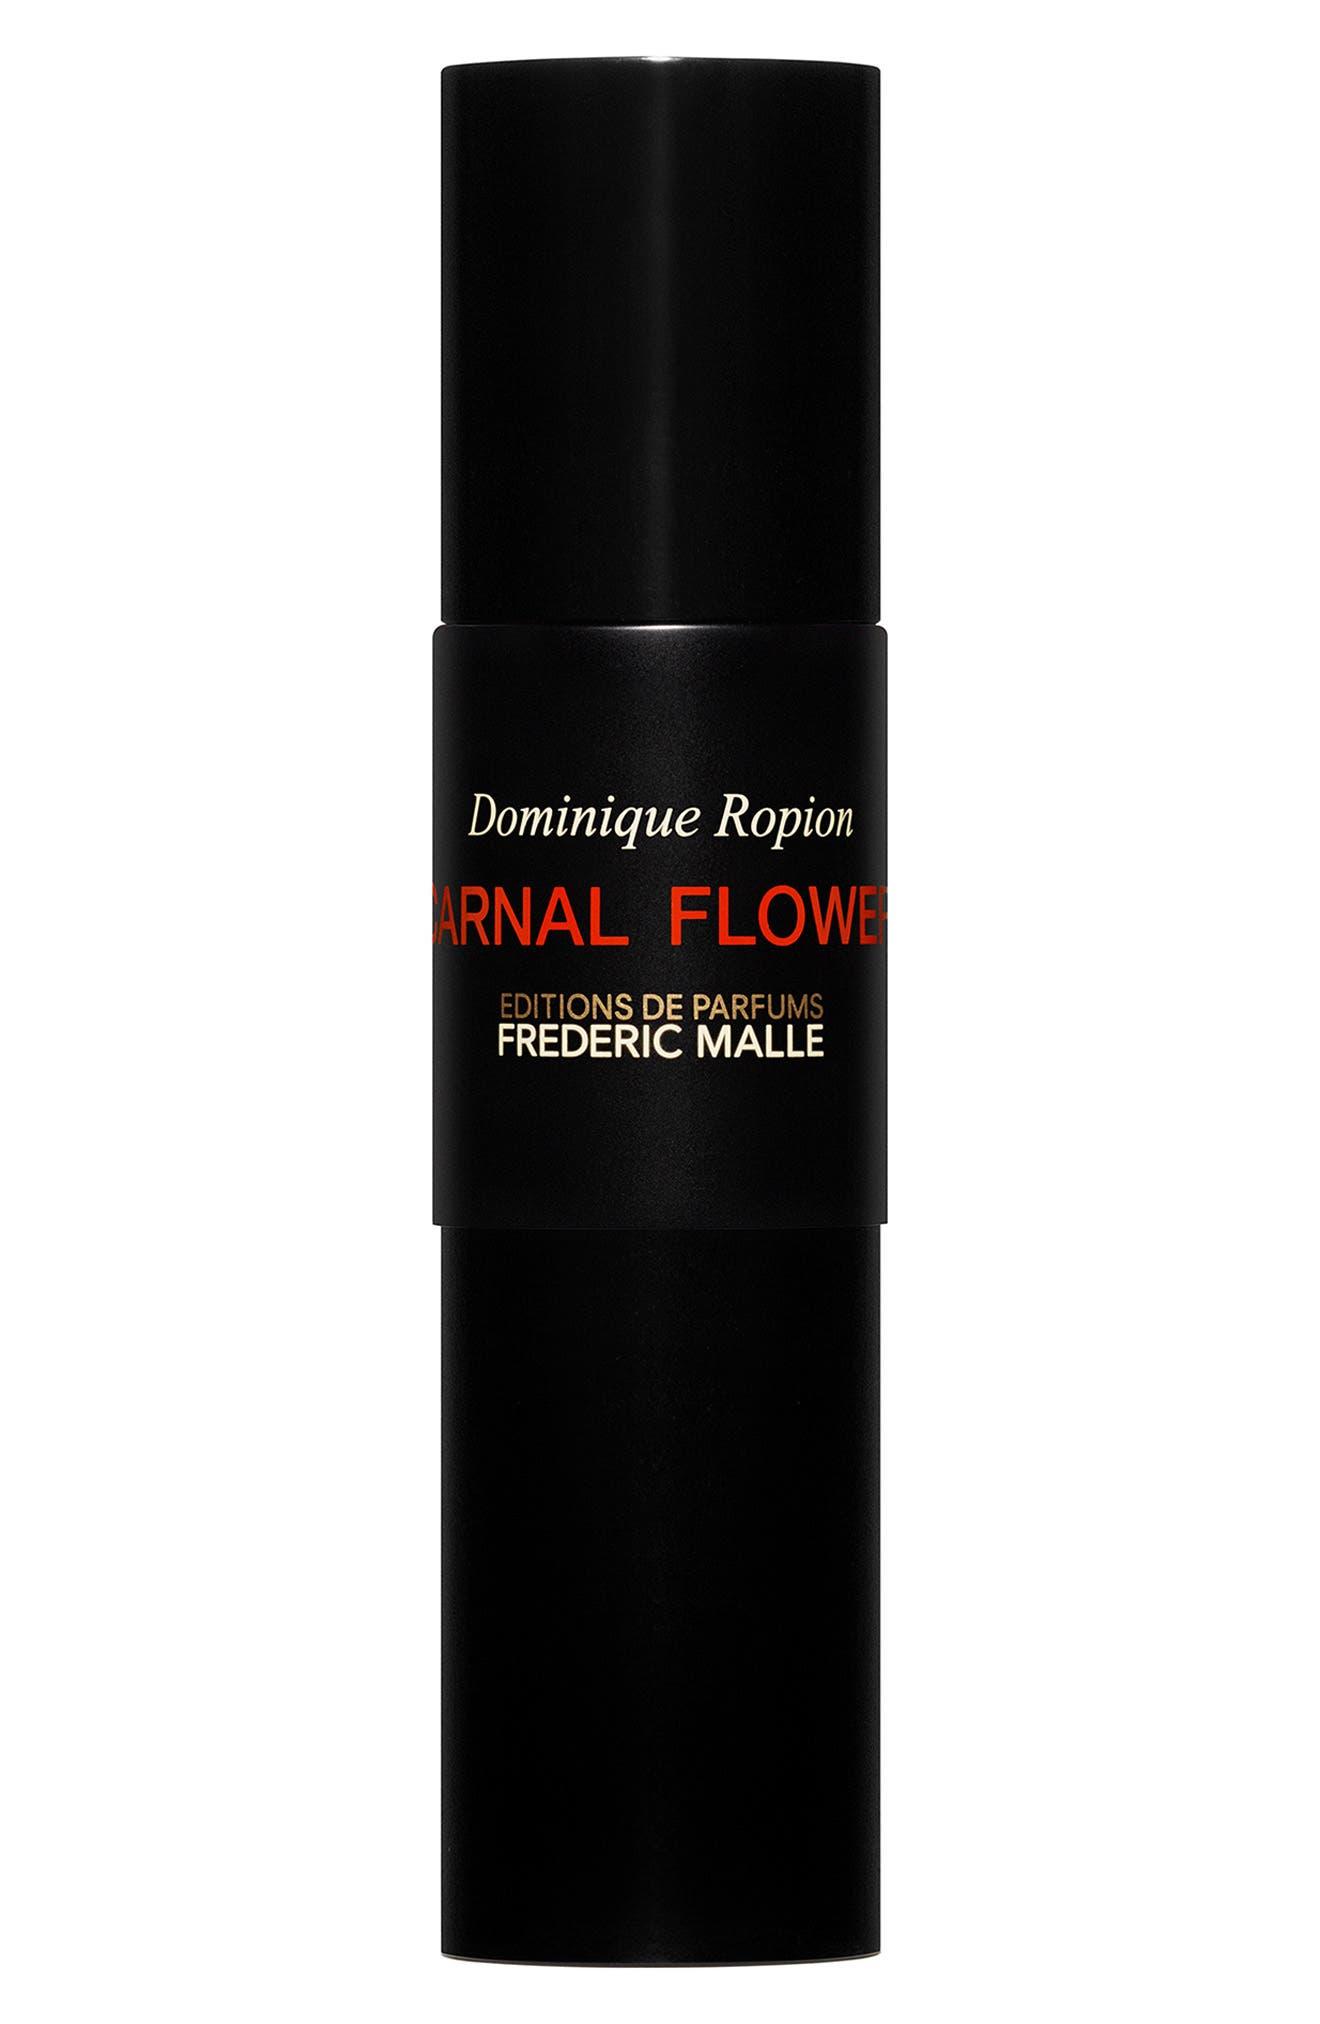 FREDERIC MALLE Editions de Parfums Frédéric Malle Carnal Flower Travel Parfum Spray, Main, color, NO COLOR